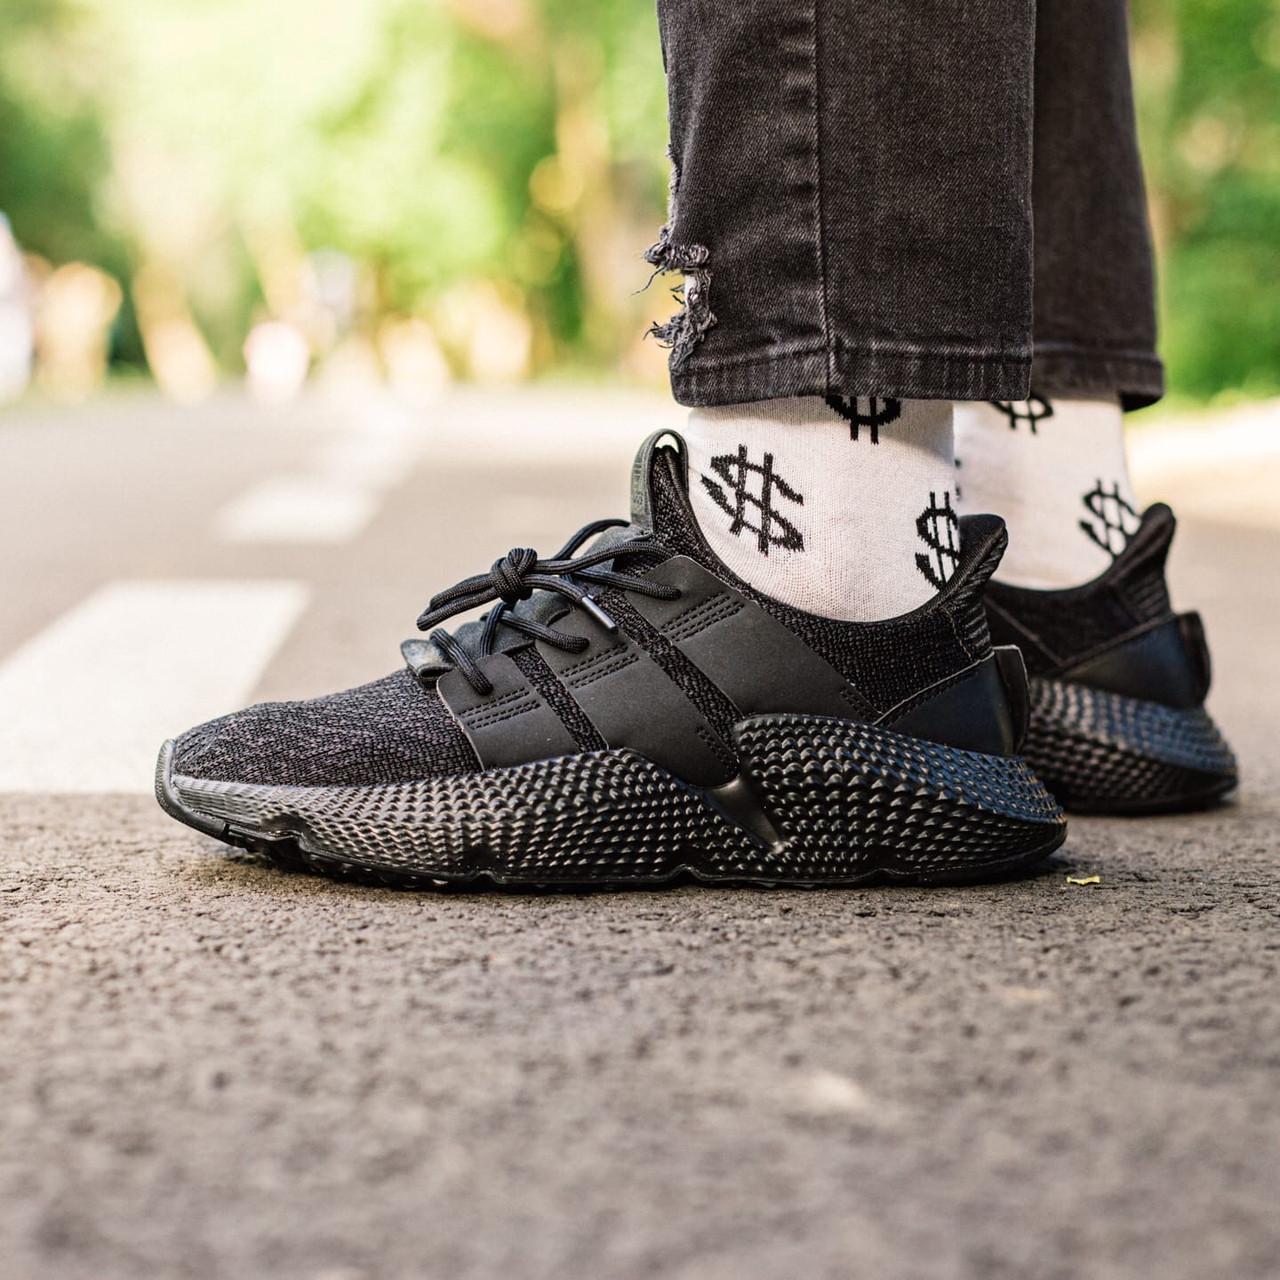 Мужские кроссовки Adidas Prophere All Black, Реплика